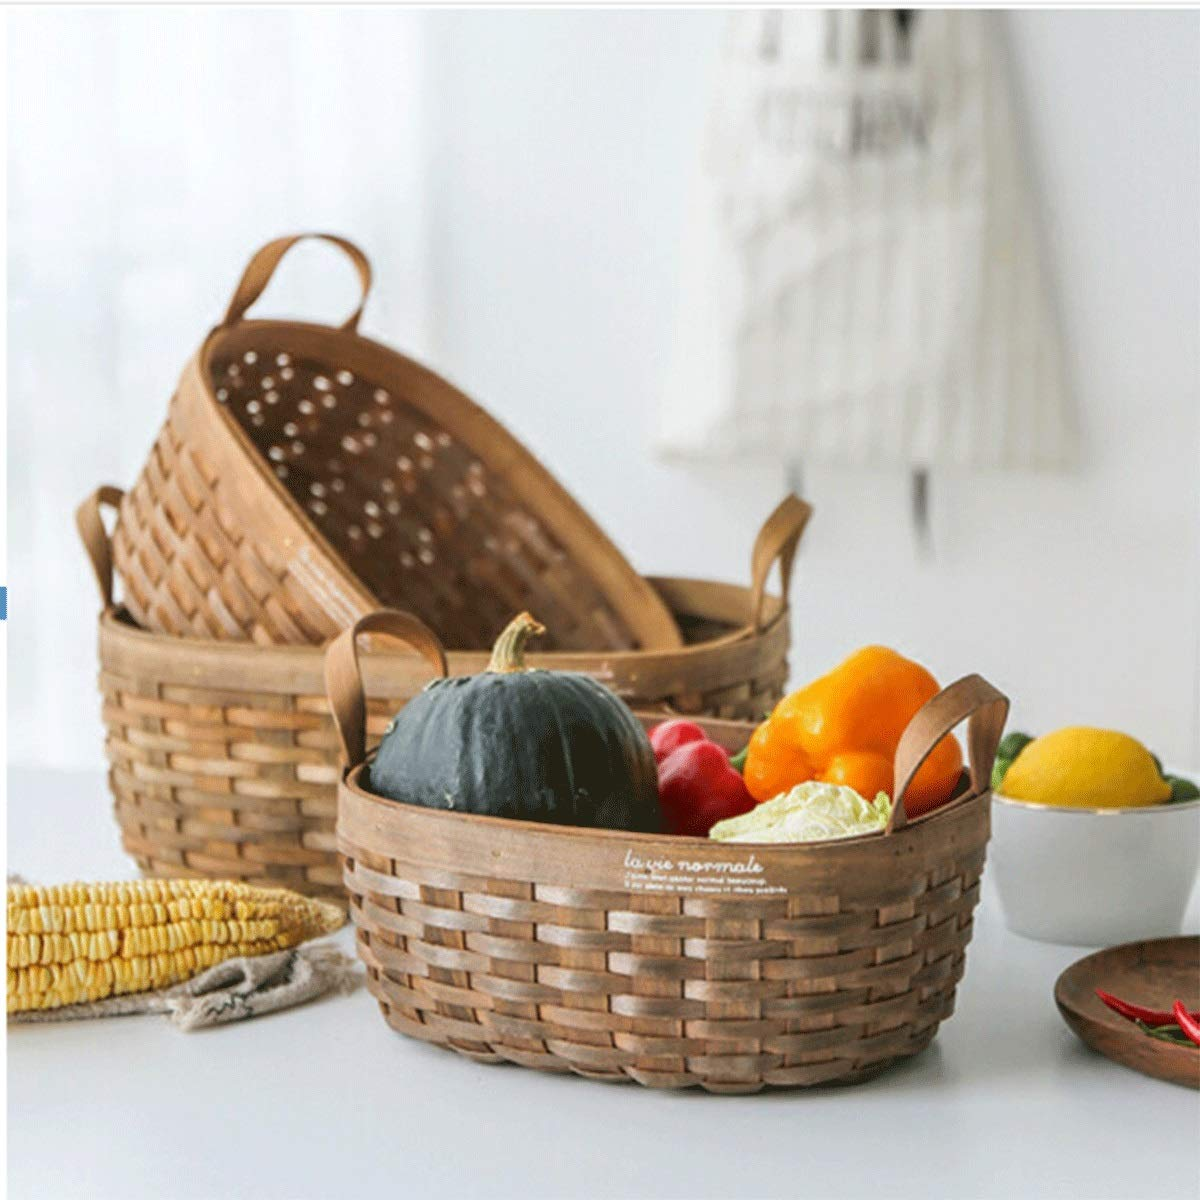 Tongboshi Bread Basket, Hand-Woven Storage Basket (with Handle), Picnic Fruit Bread Basket, Storage Basket, Oval Fruit Basket Three-Piece, Latest Models (Color : 3-Piece Set) by Tongboshi (Image #2)